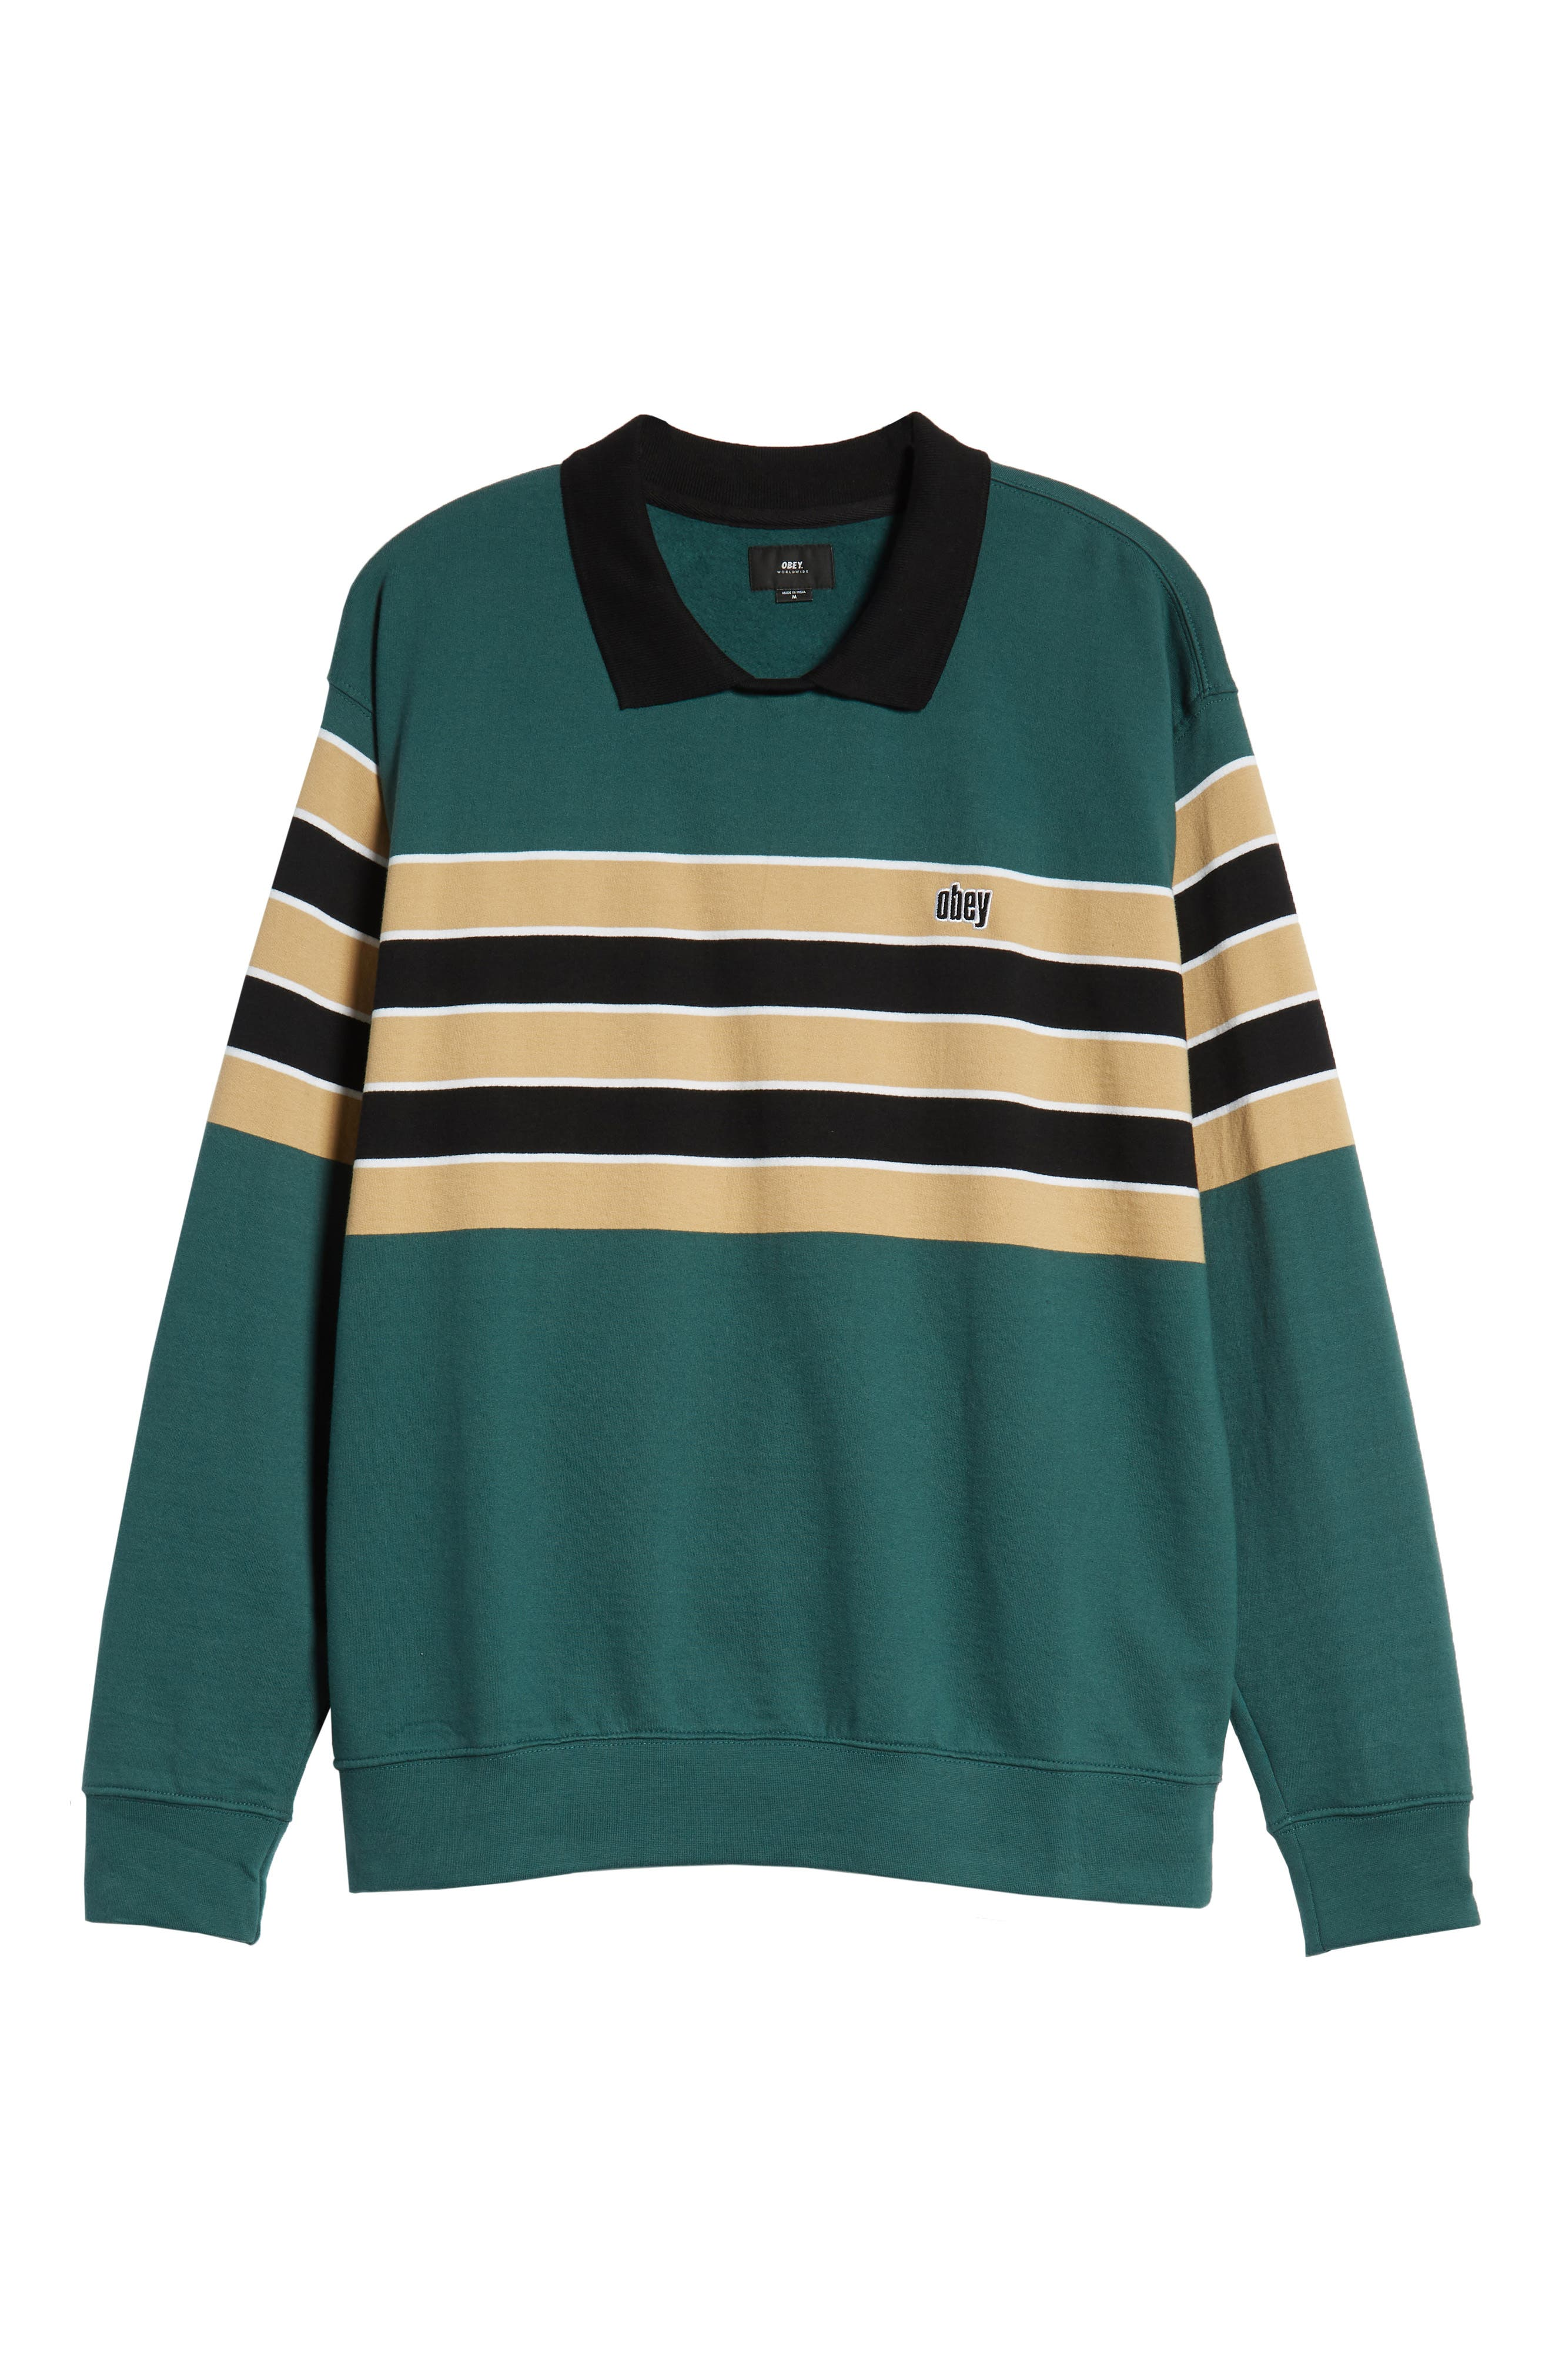 Cupid Striped Polo Collar Sweatshirt,                             Alternate thumbnail 6, color,                             DARK TEAL MULTI